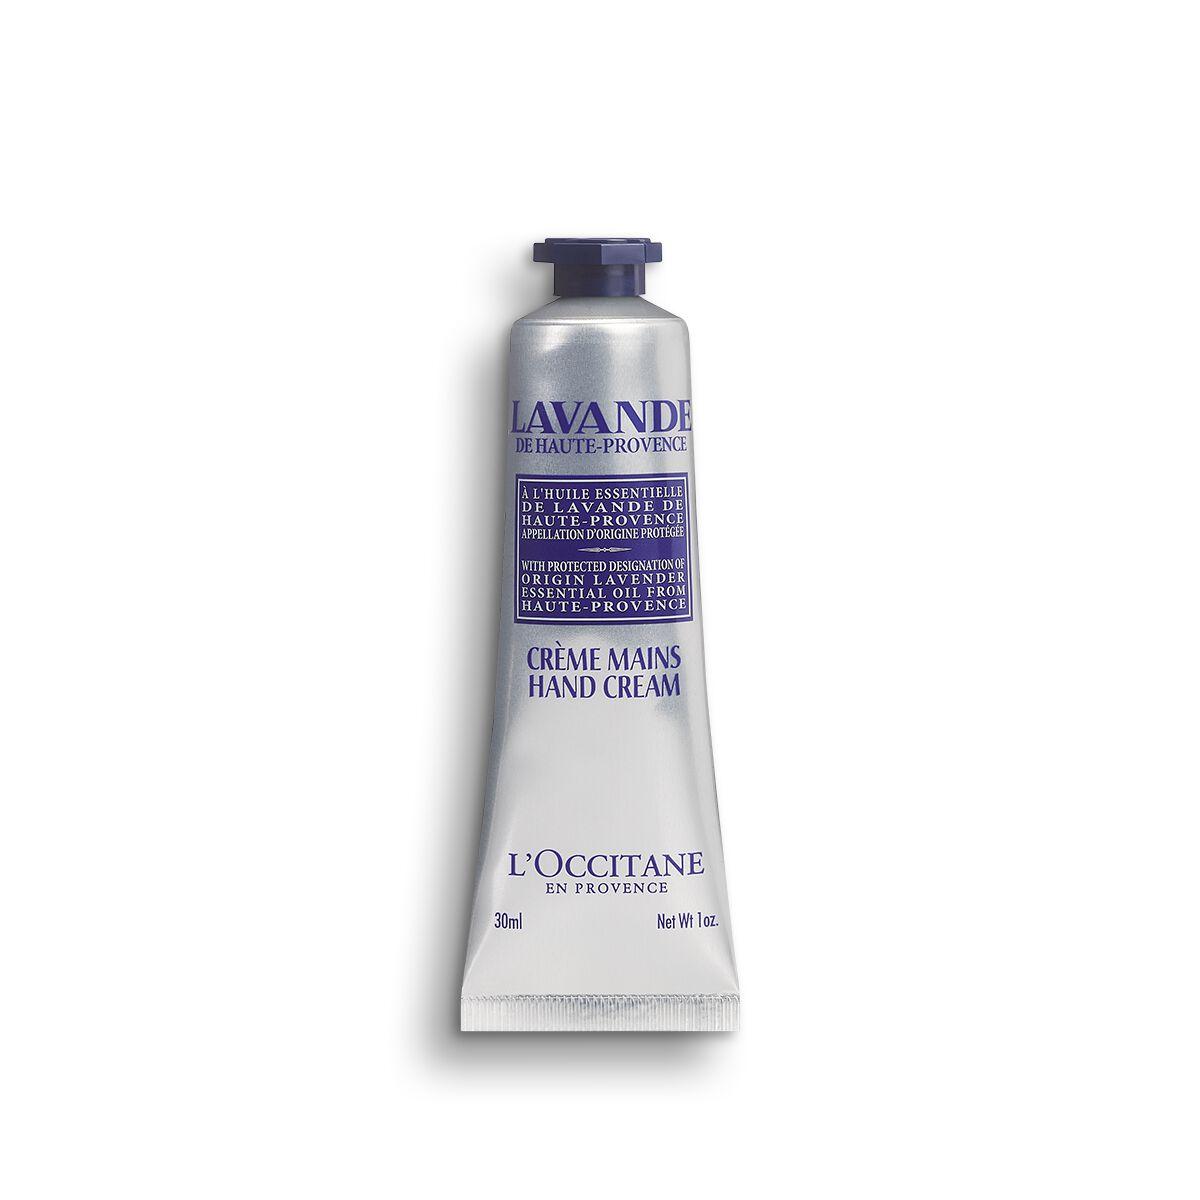 L'Occitane En Provence for Lavender Hand Cream 1 oz. IBT Shop